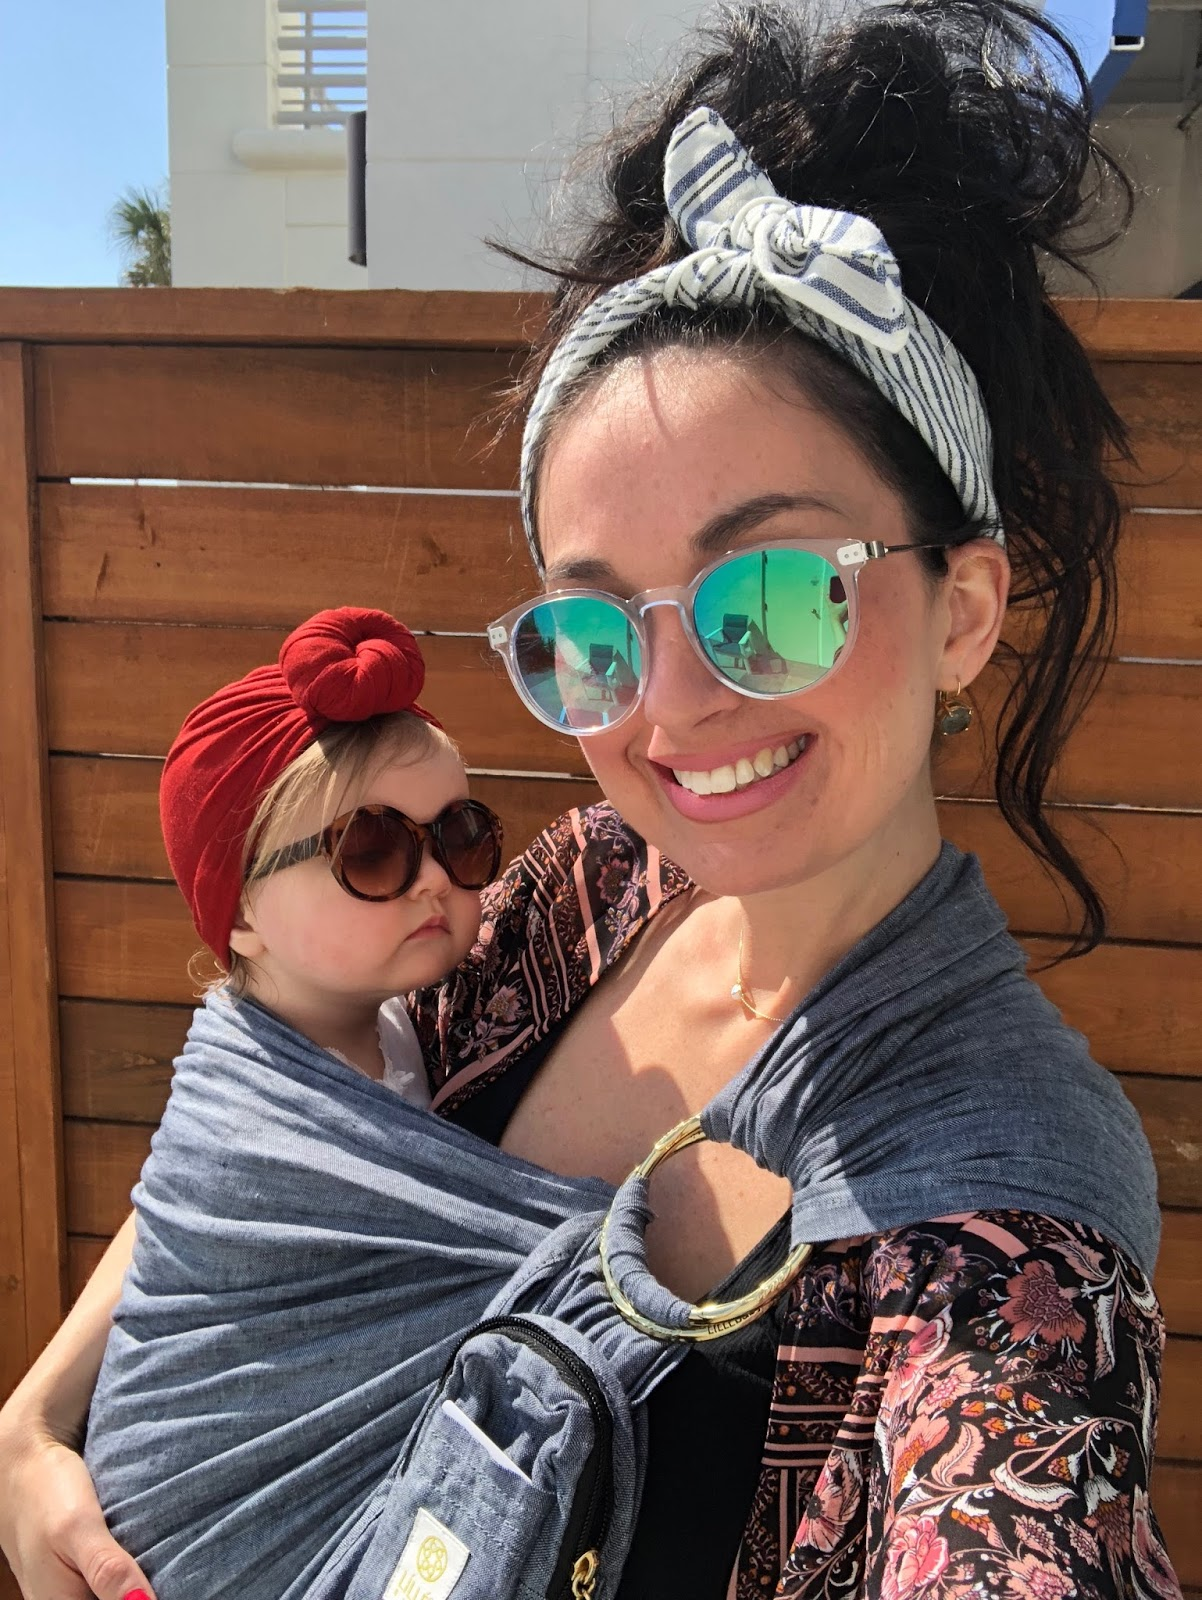 Summer Fun with Head Wraps, Dry Shampoo, & Sunglasses